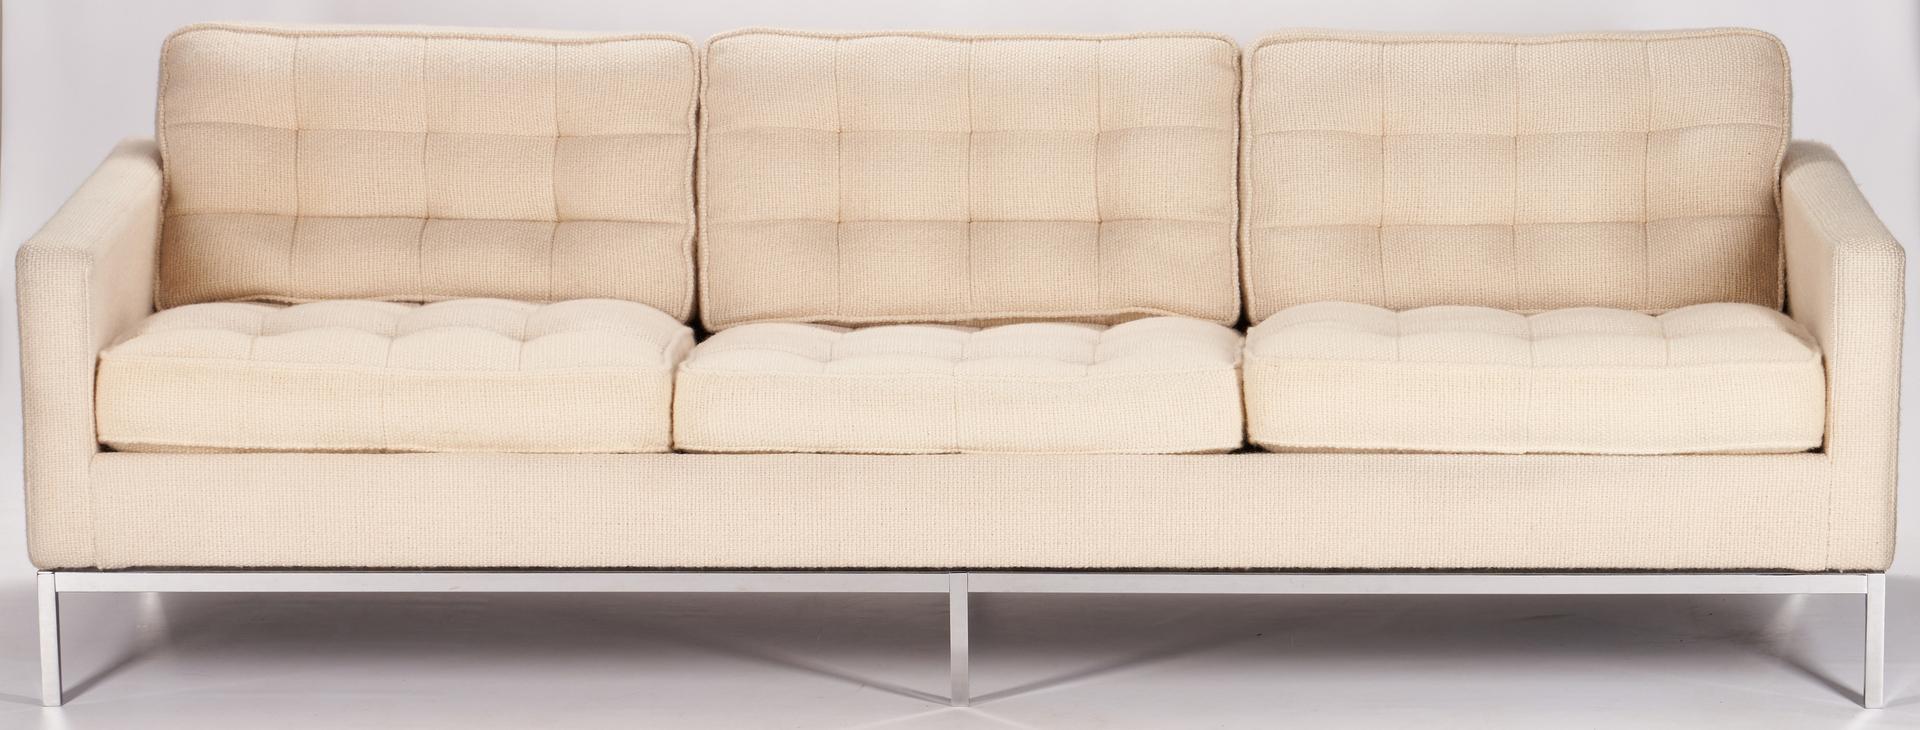 Lot 595: Mid-Century Knoll Parallel Bar System Sofa